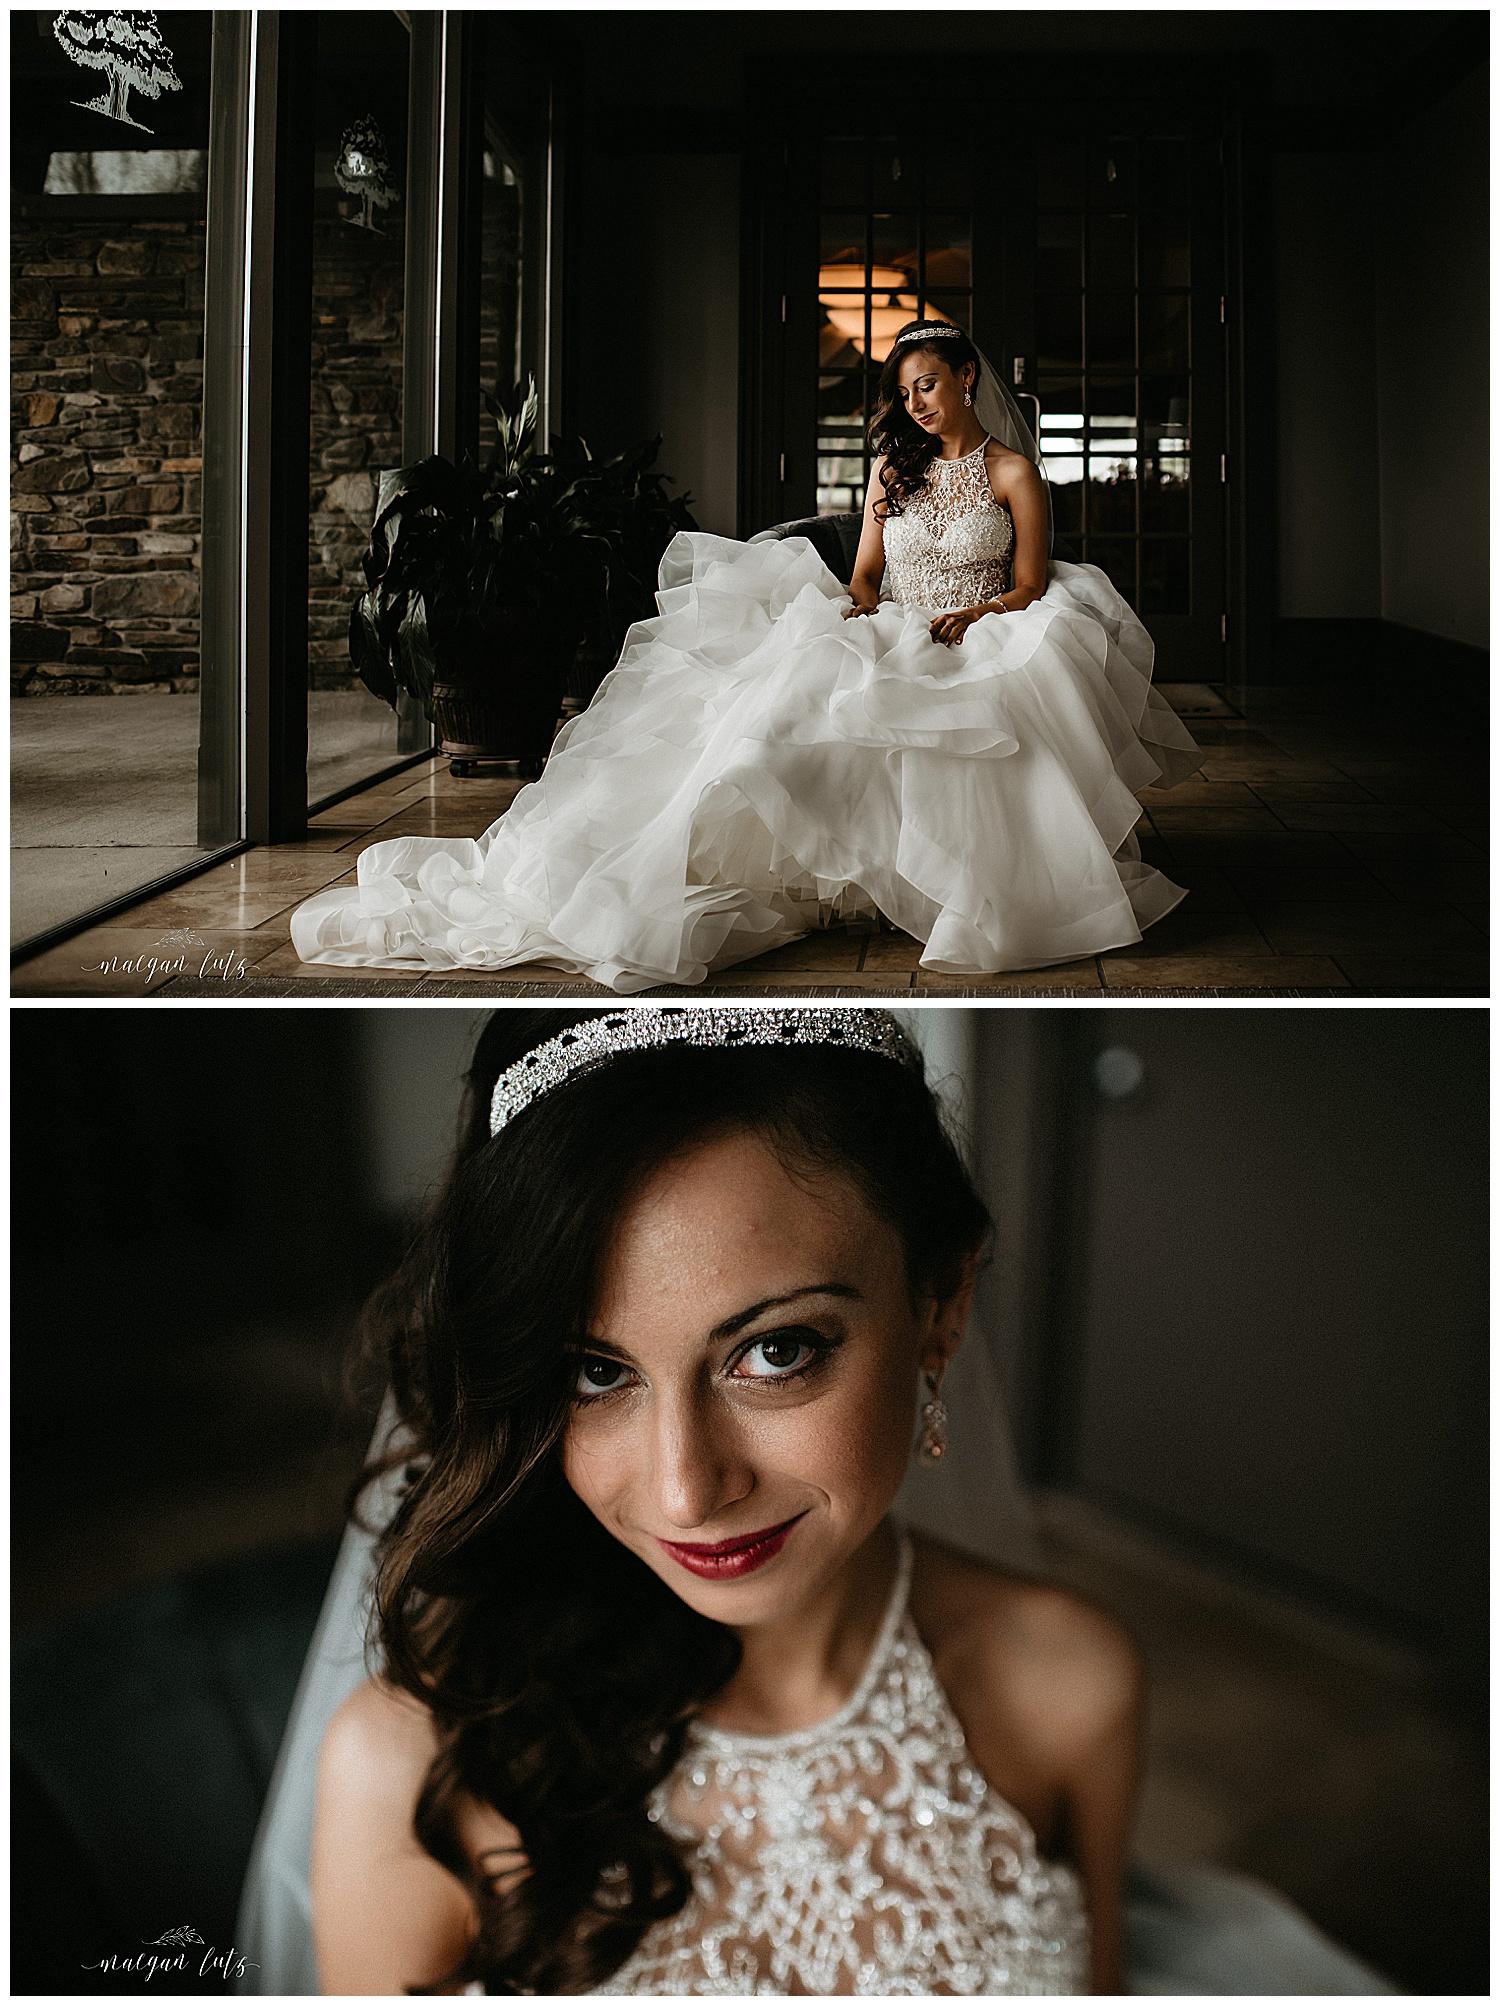 NEPA-Lehigh-Valley-Wedding-Photographer-at-Glen-Oak-Country-Club-Clarks-Summit-PA_0012.jpg